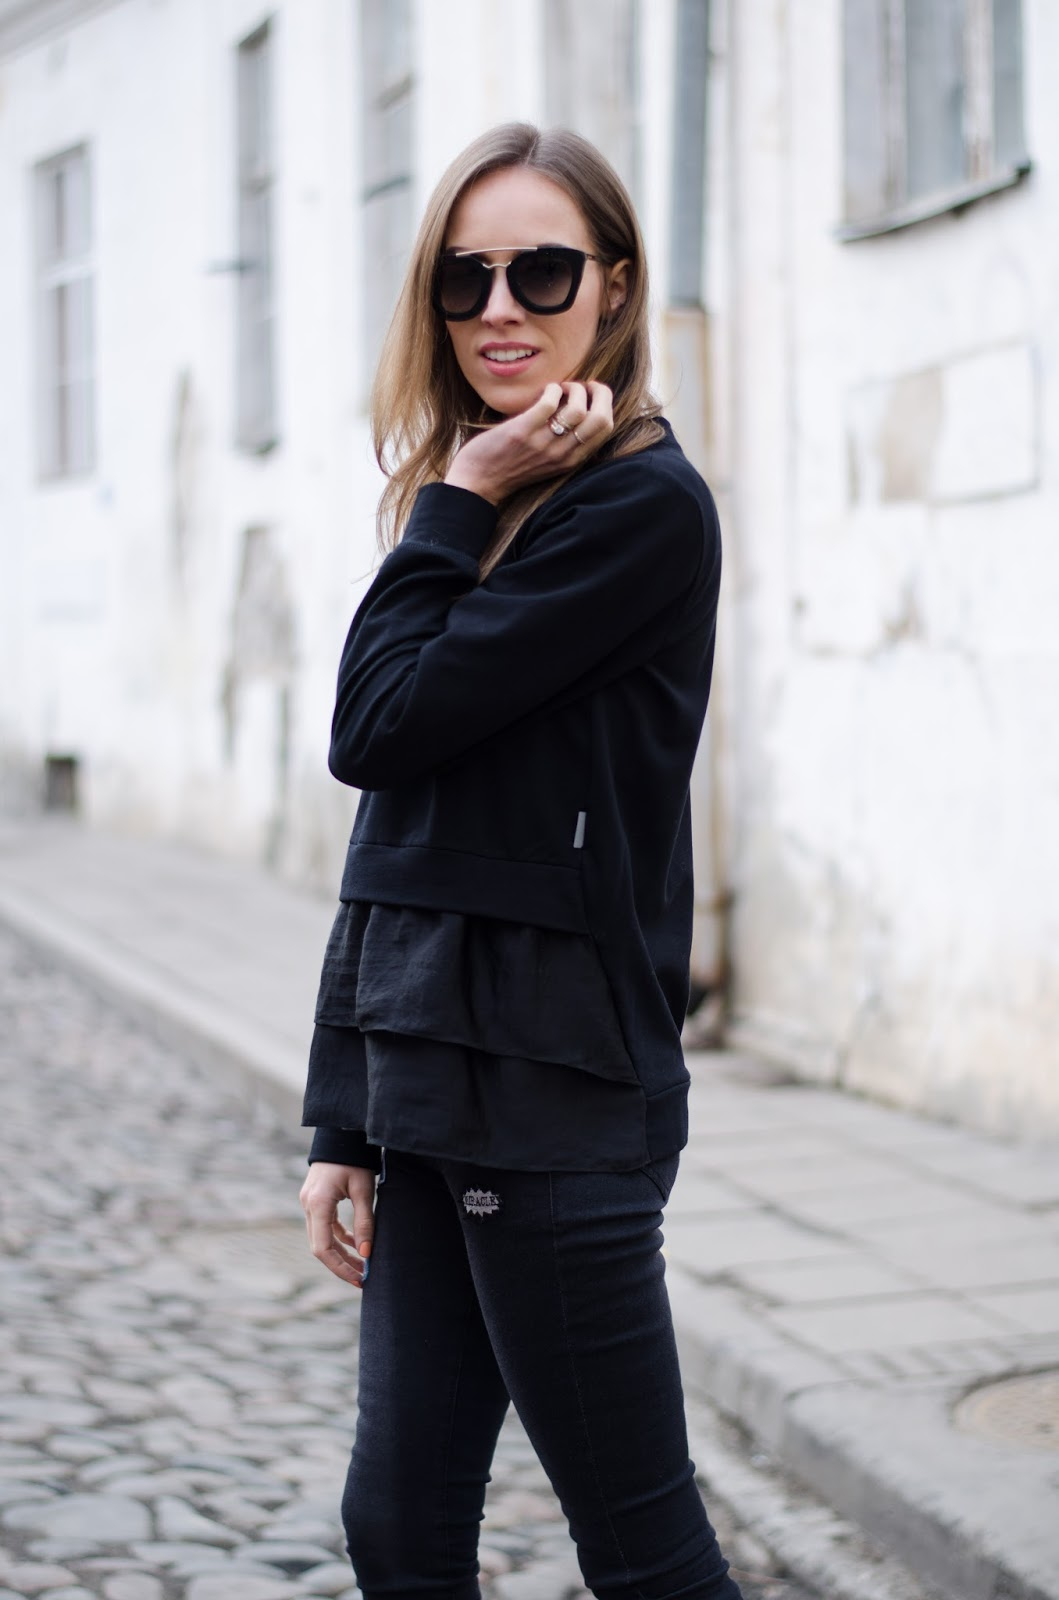 kristjaana mere m theory london black silk front sweater